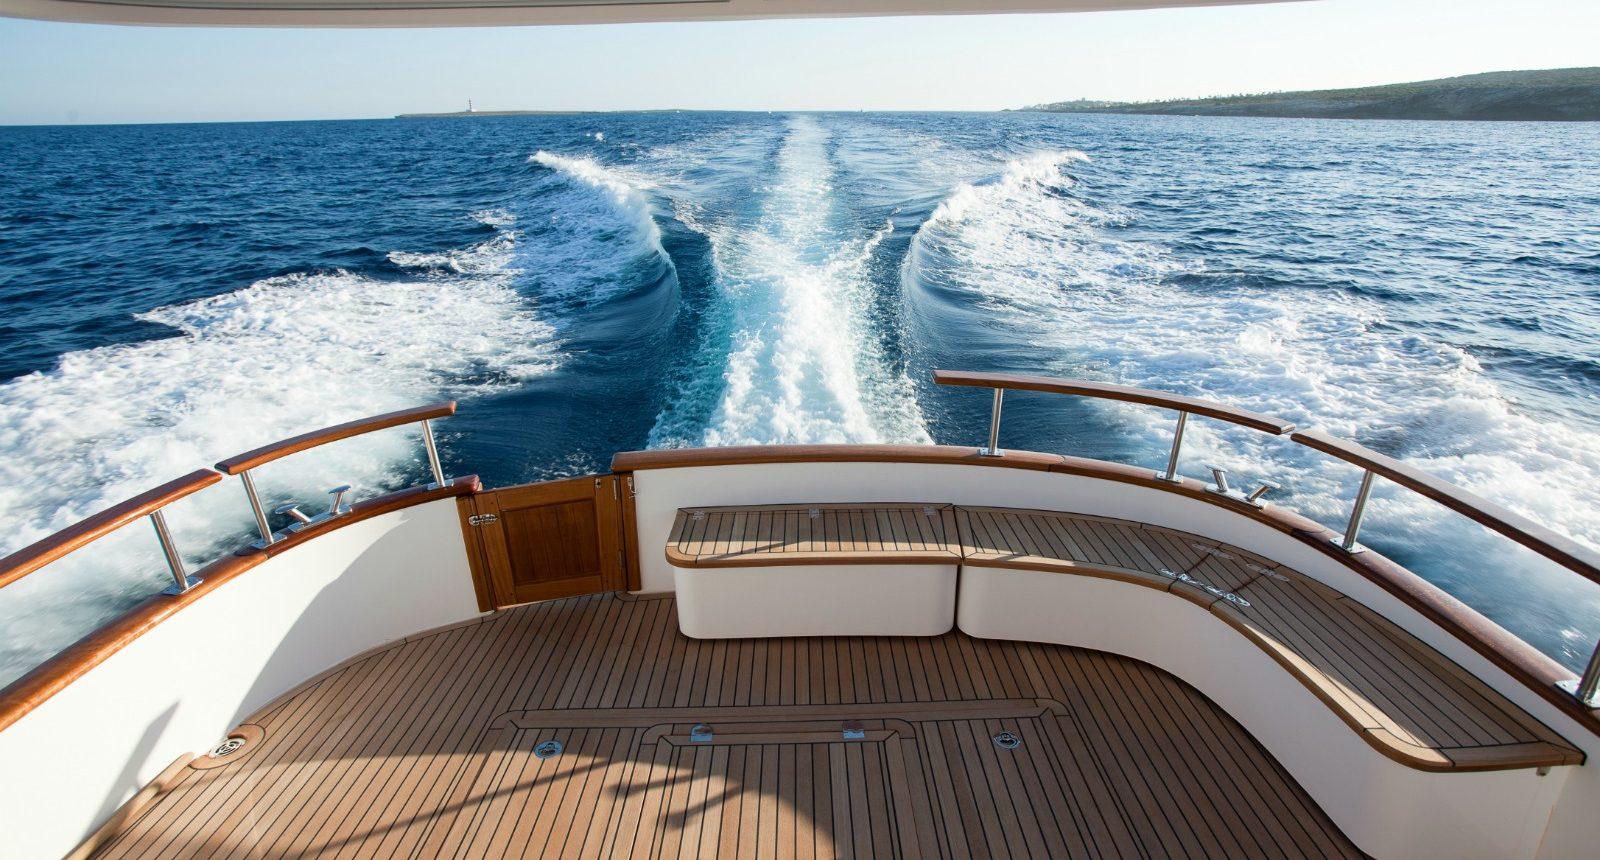 Minorca Islander 42 yacht for sale - back deck